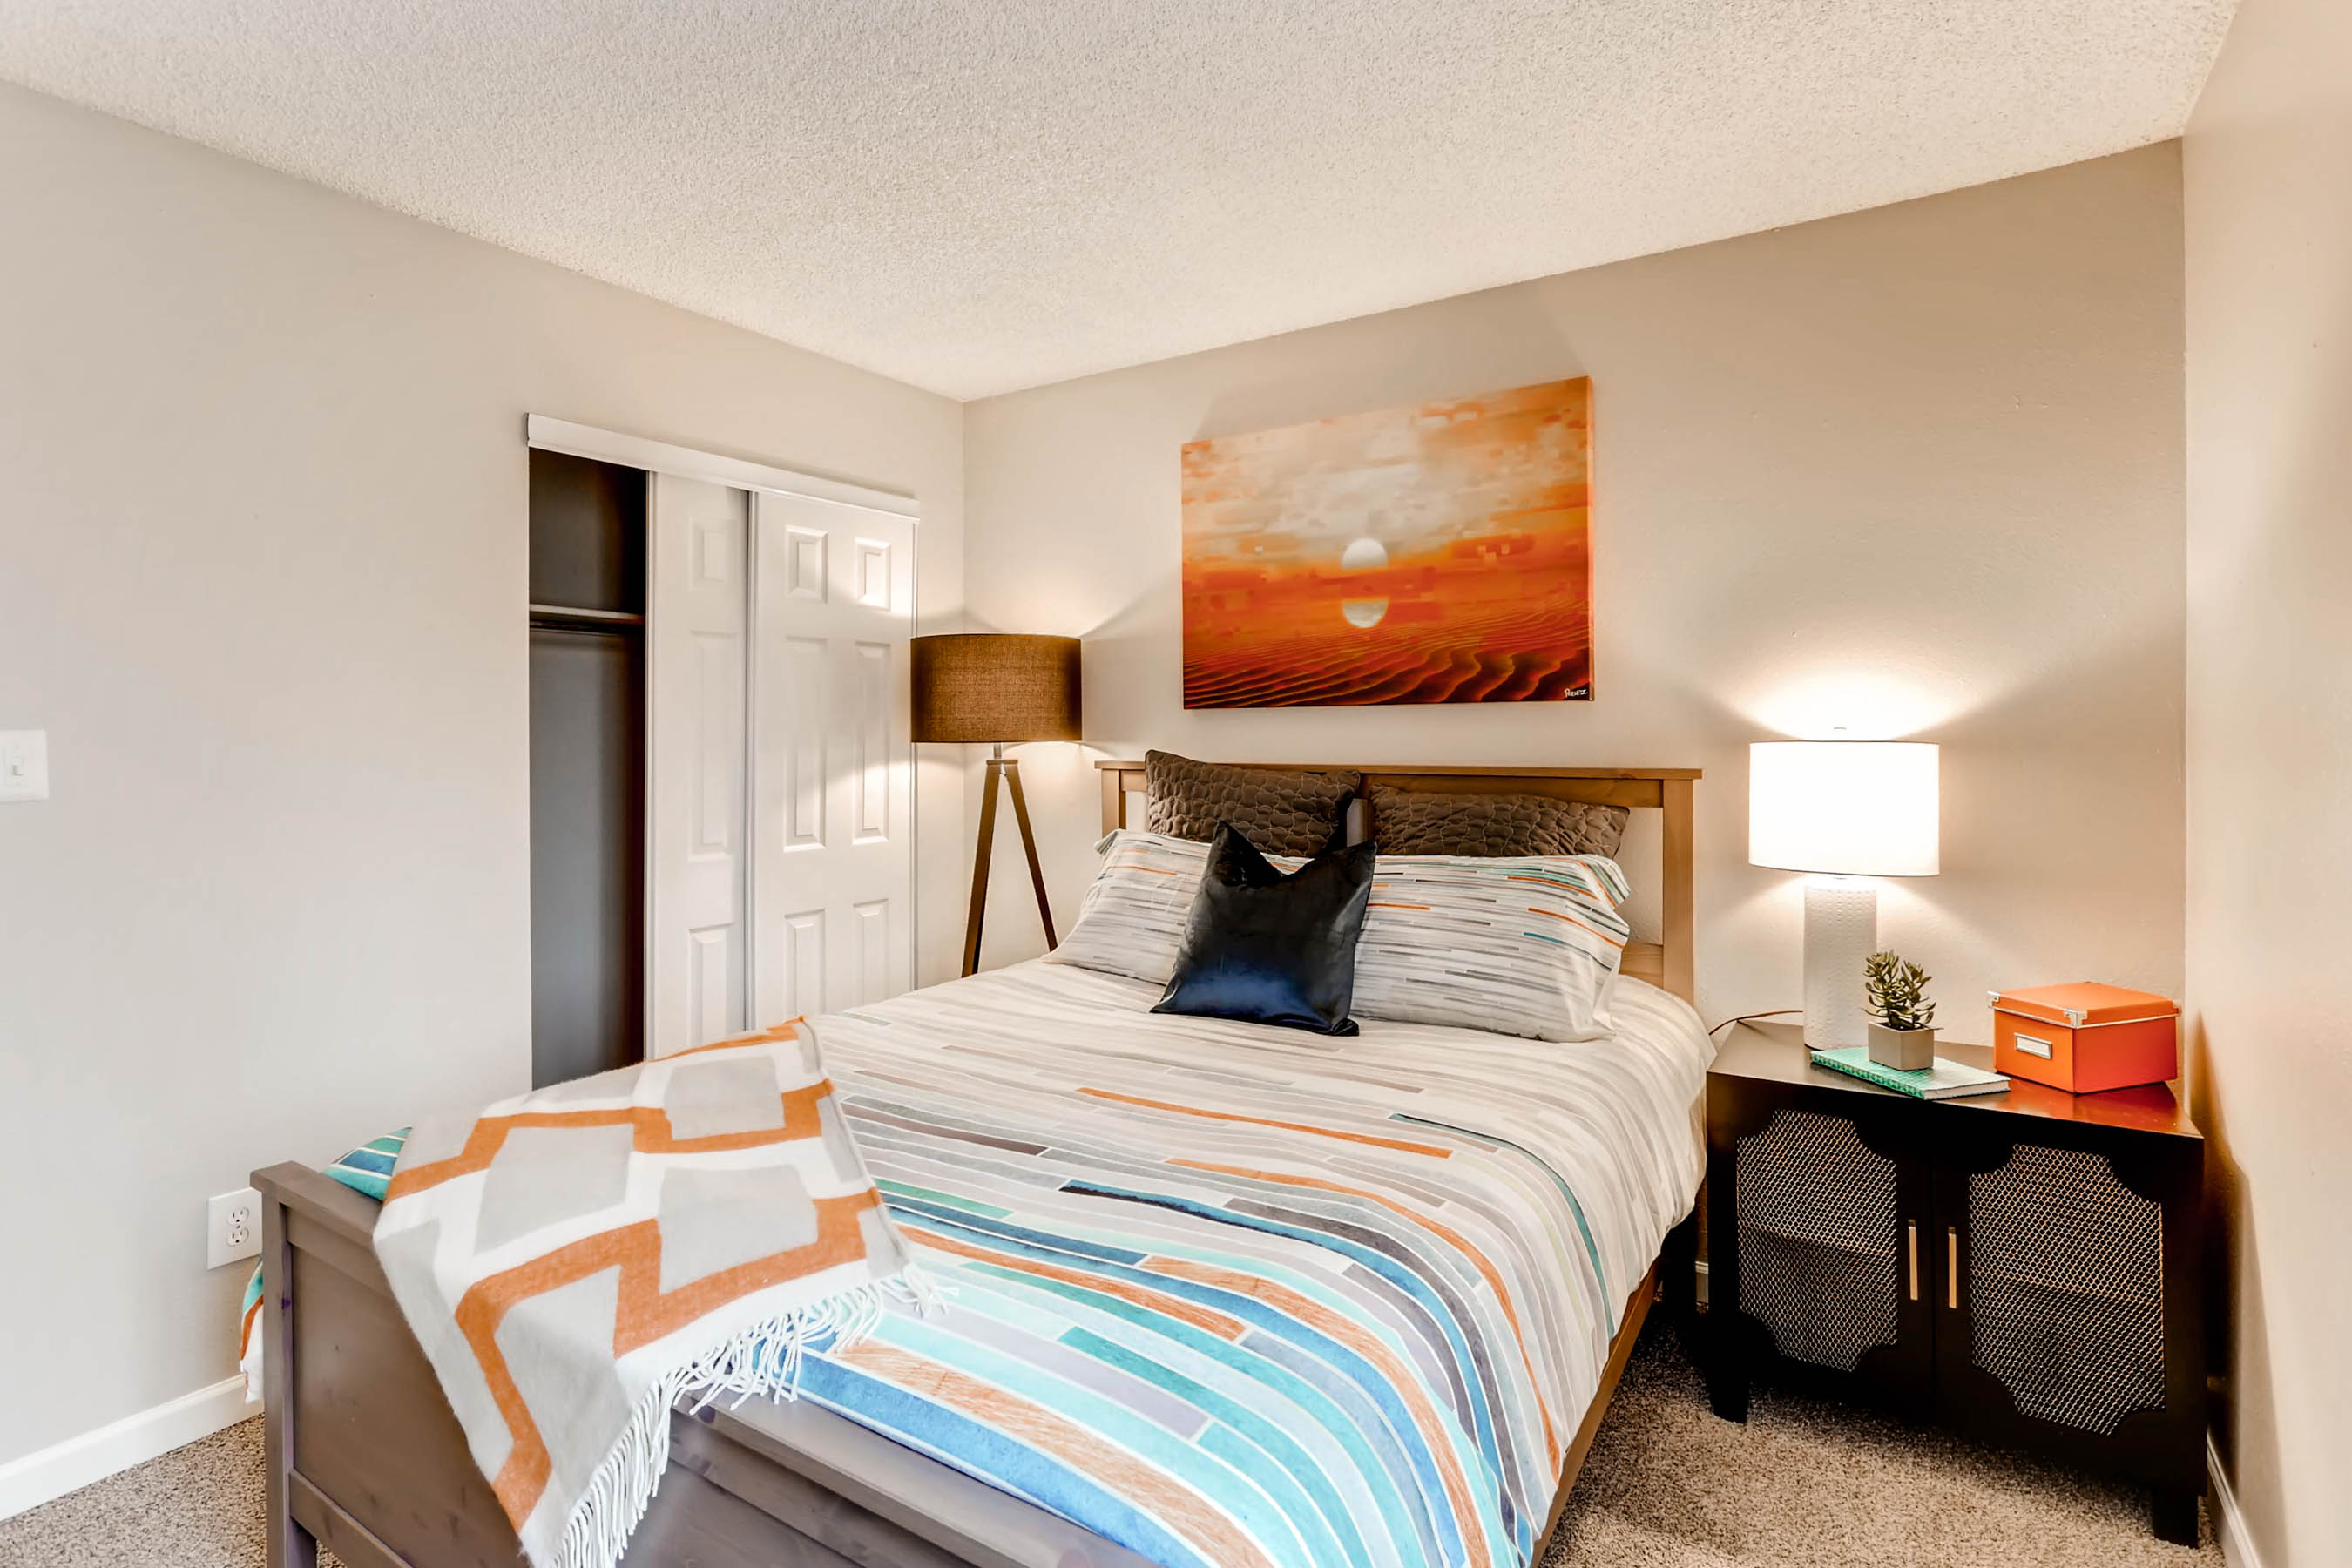 Highland Way Apartments image 5